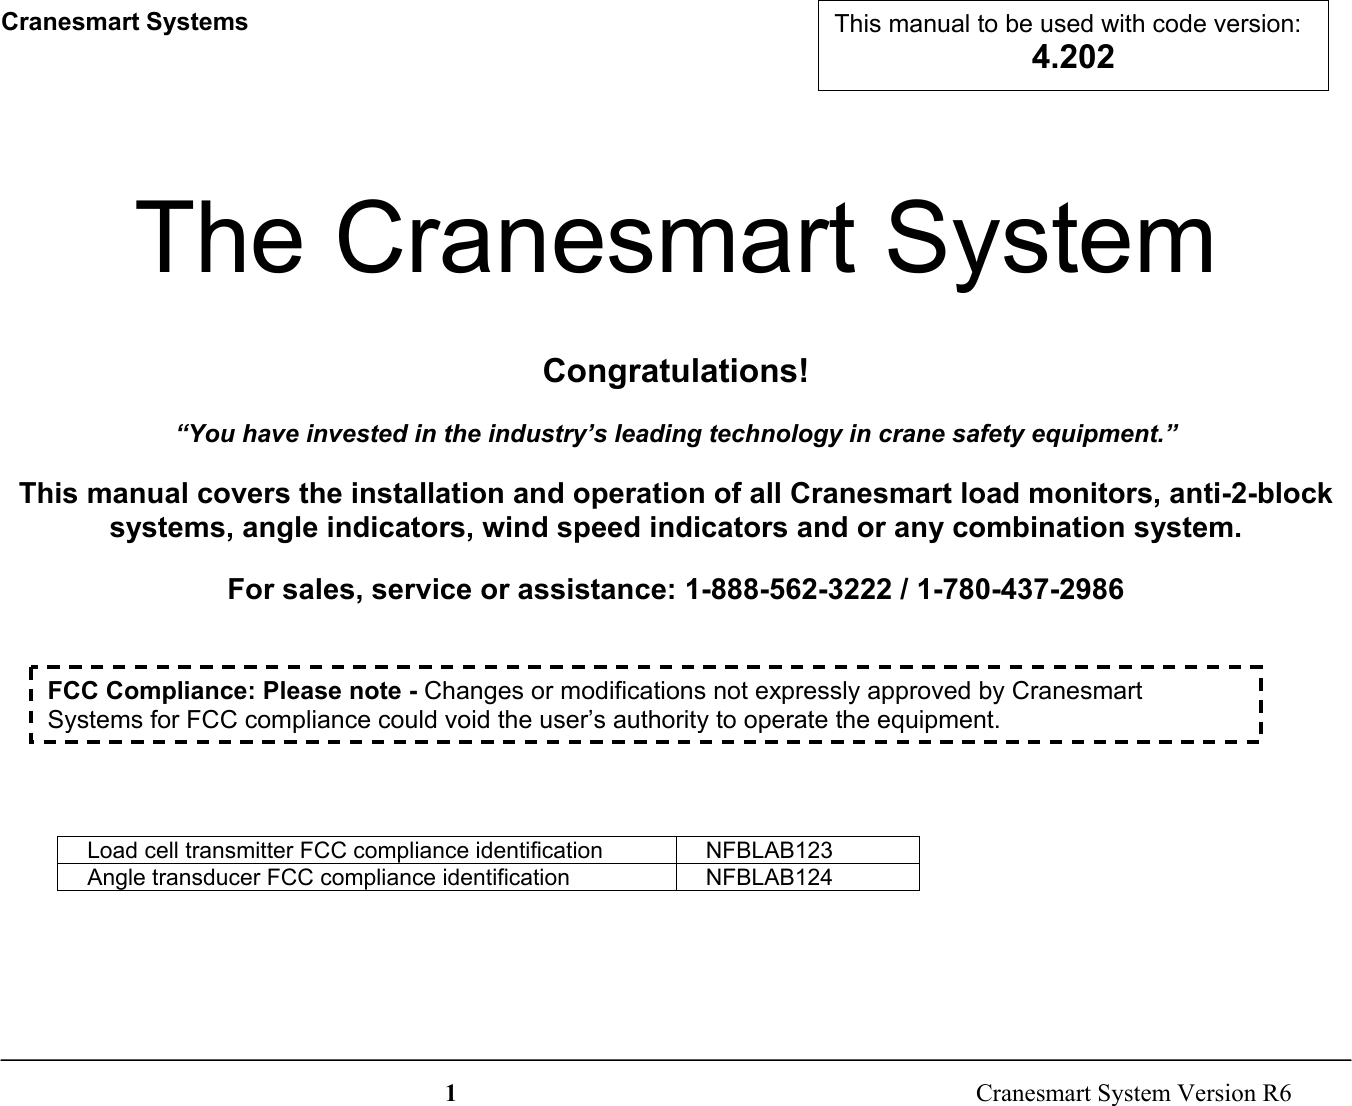 cranesmart systems lab123 wireless weight transducer user manual 900 rh usermanual wiki User Manual Icon User Manual PDF